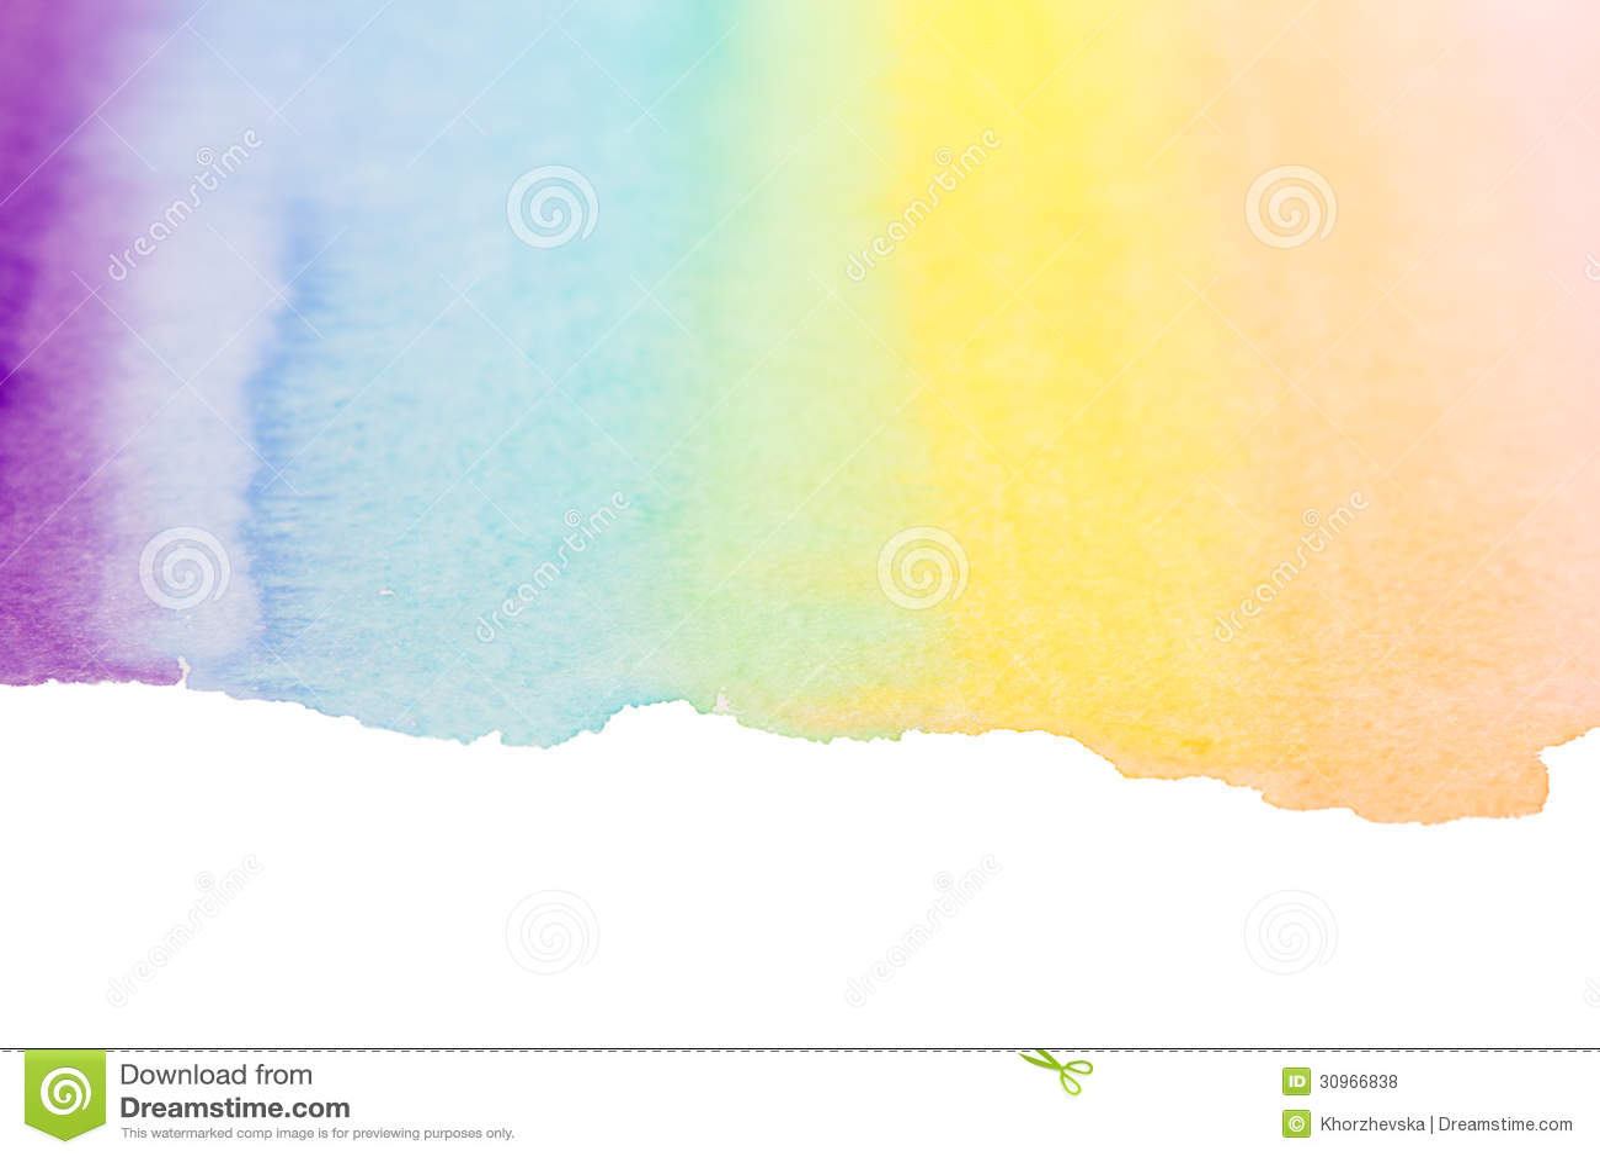 rainbow watercolor art background stock illustration illustration